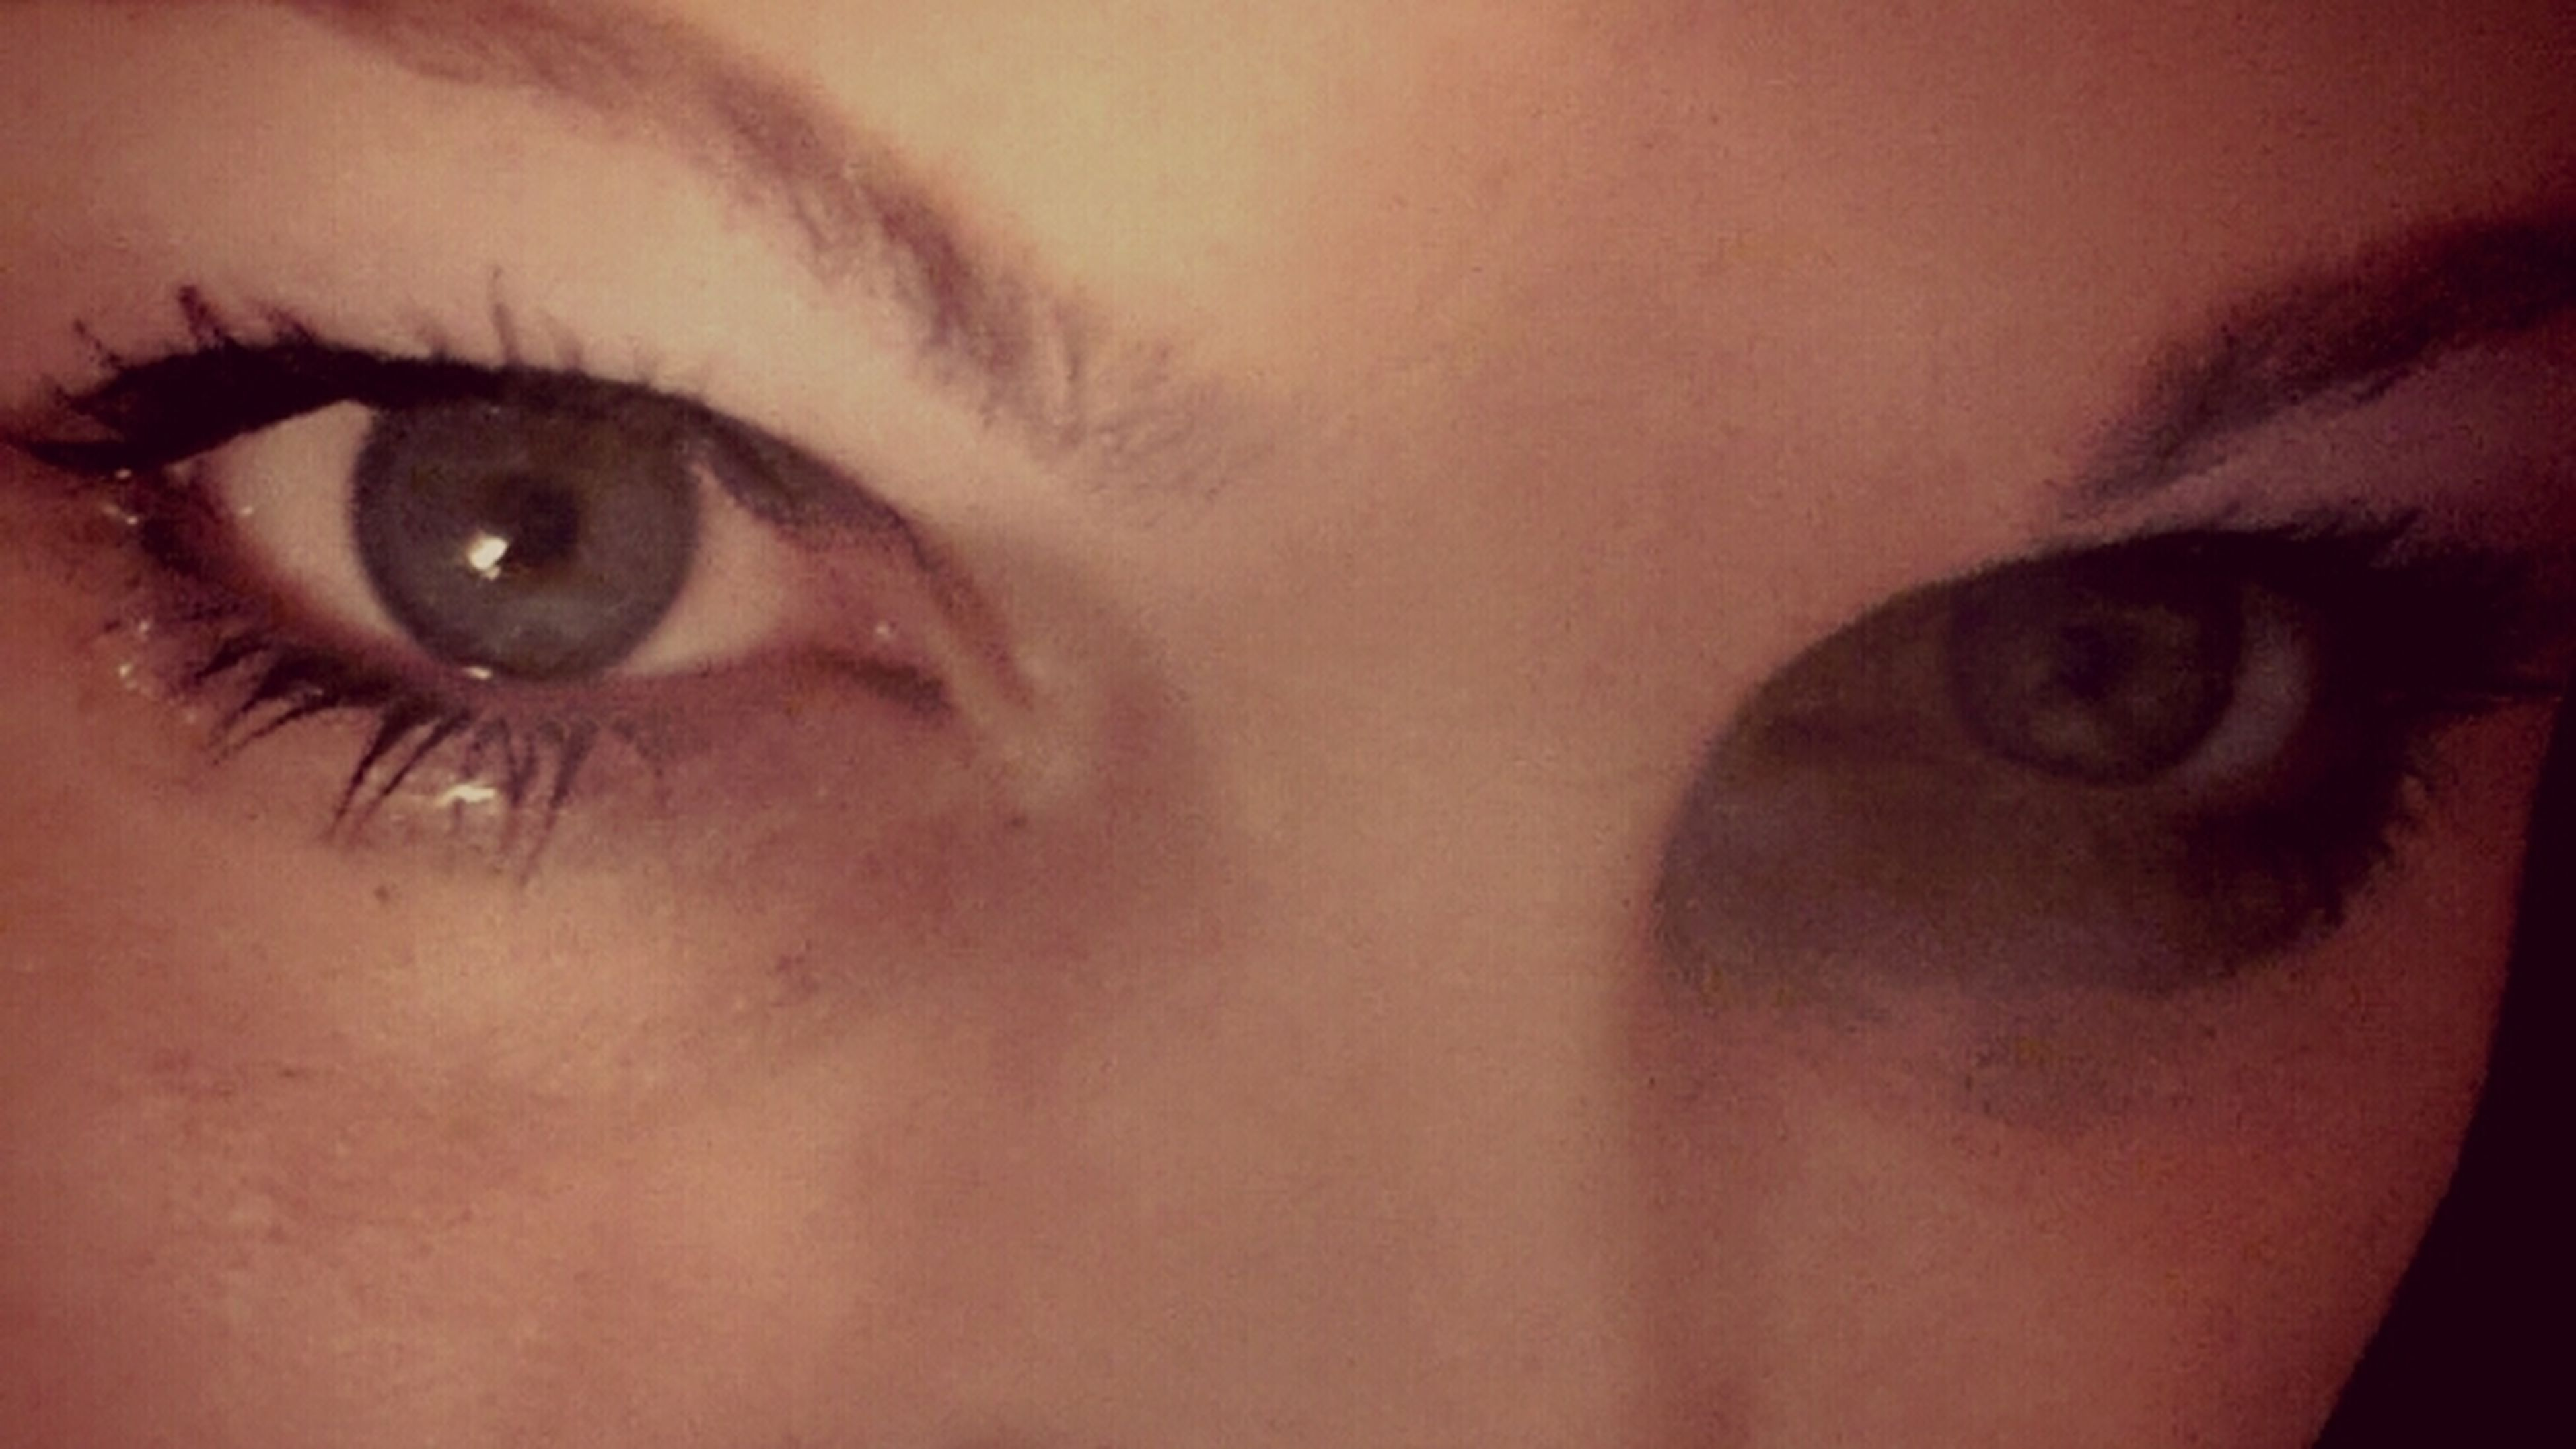 human eye, close-up, indoors, eyelash, looking at camera, portrait, human face, eyesight, part of, human skin, extreme close-up, lifestyles, sensory perception, headshot, young adult, person, extreme close up